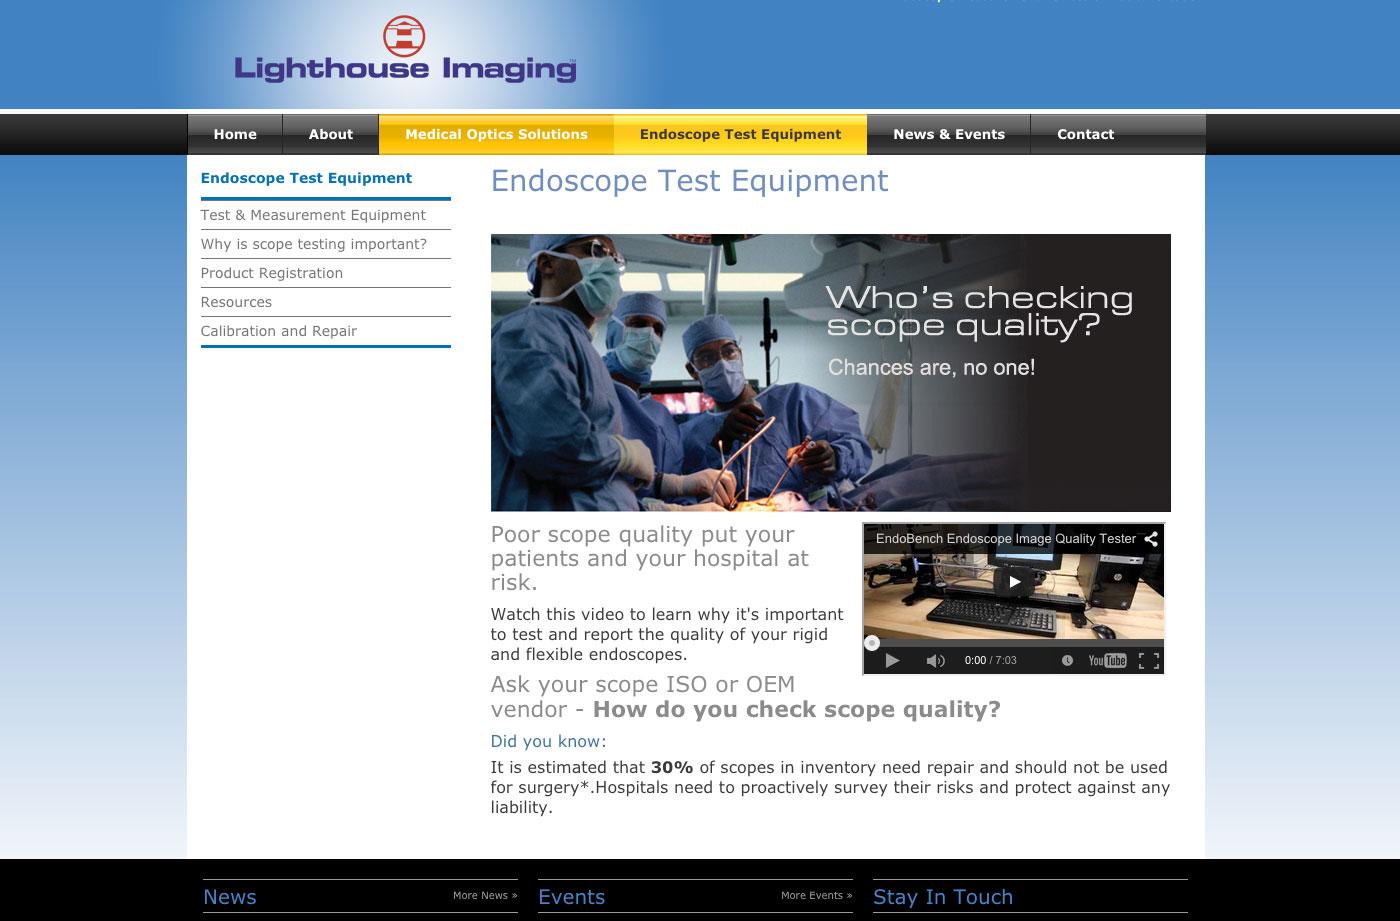 Endoscope Test Equipment